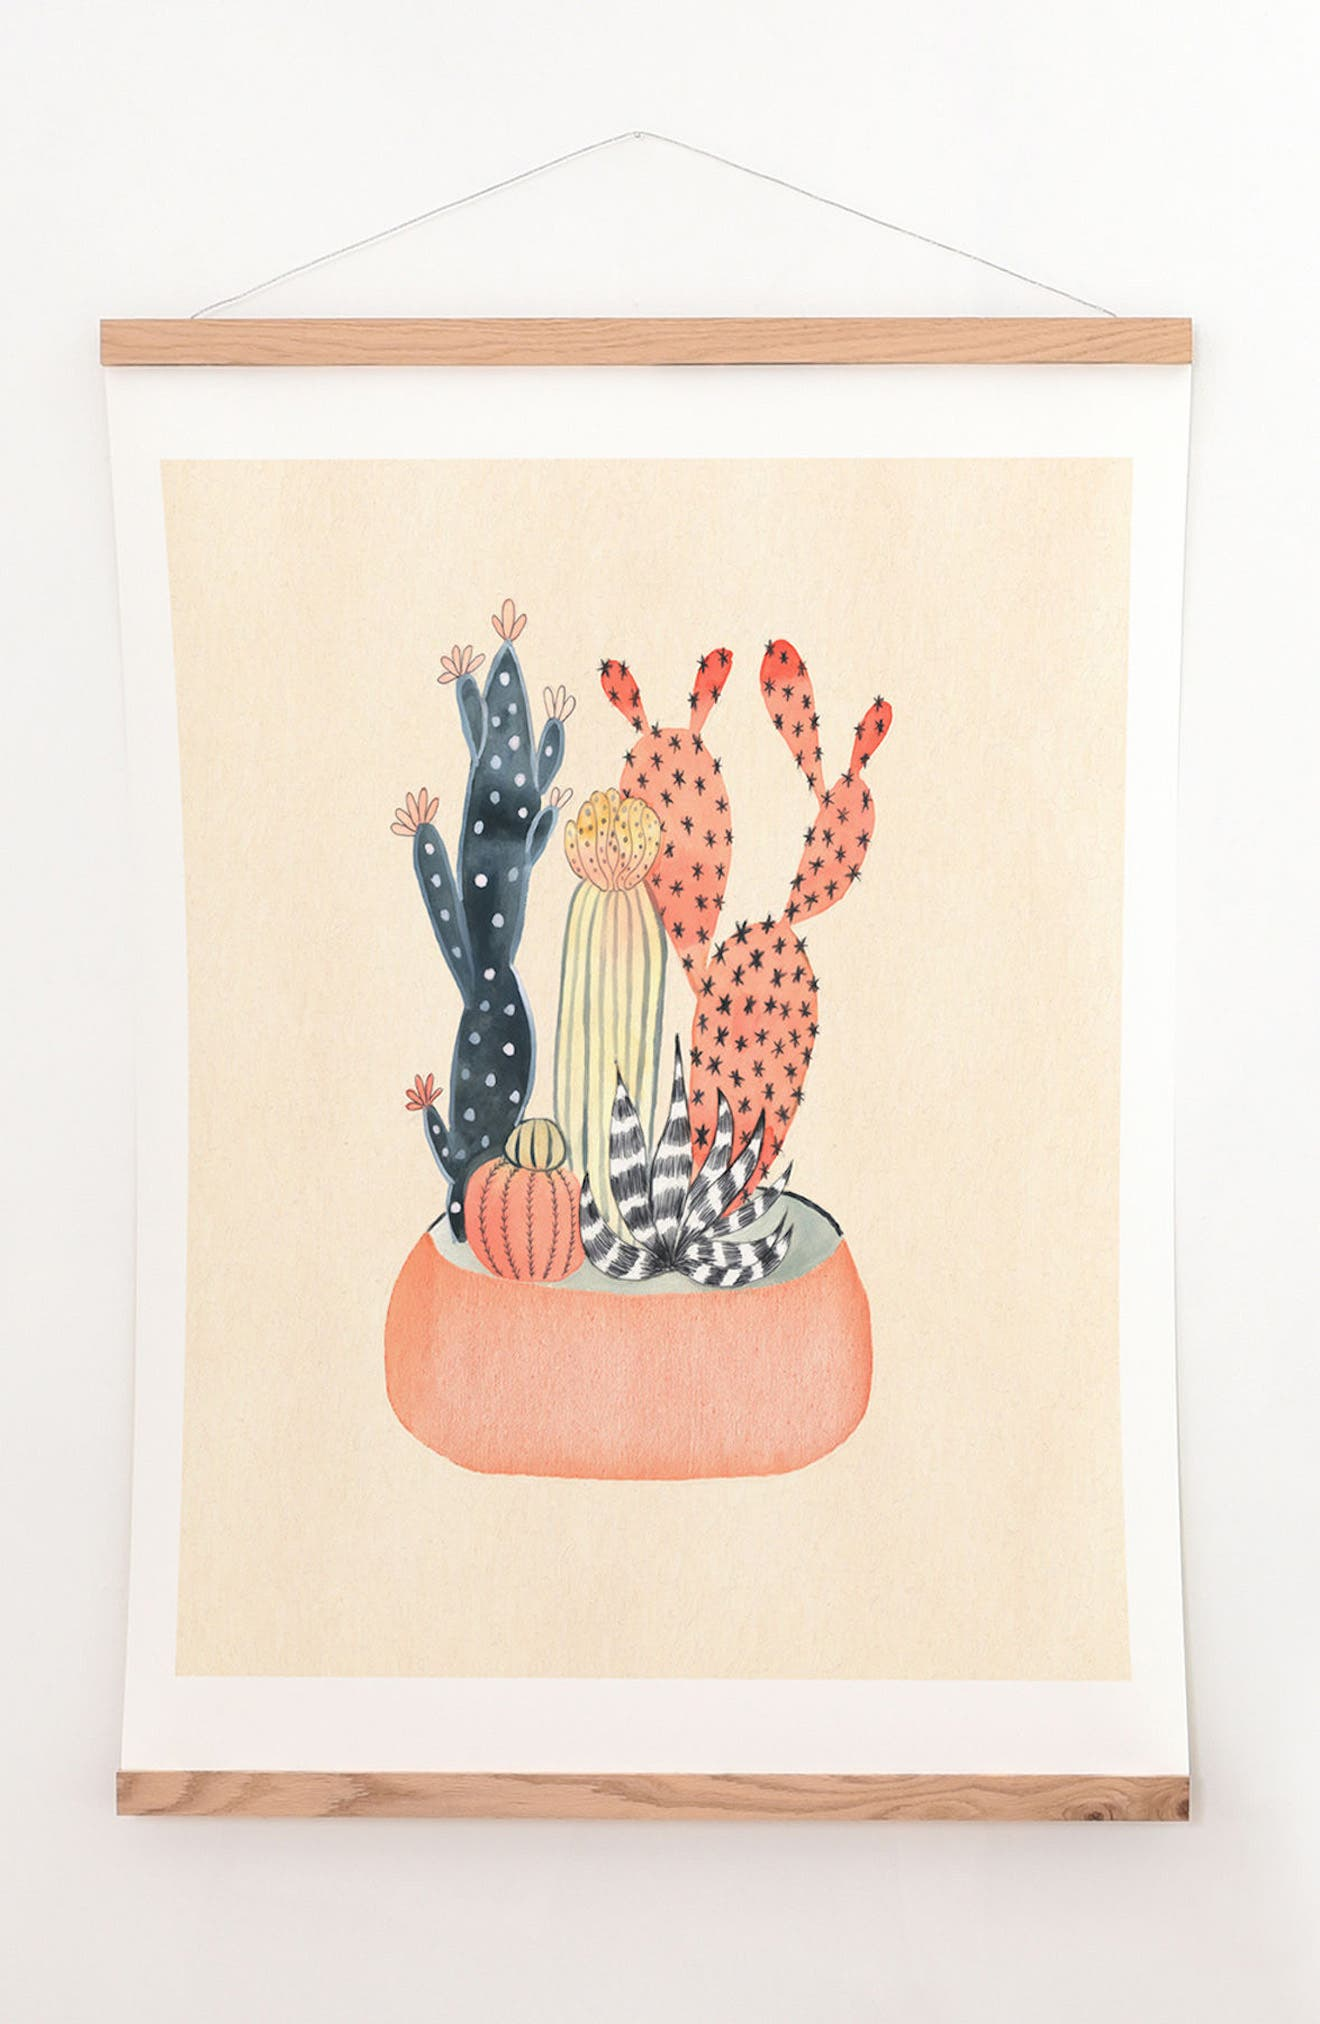 DENY Designs Cactus Print & Oak Hanger